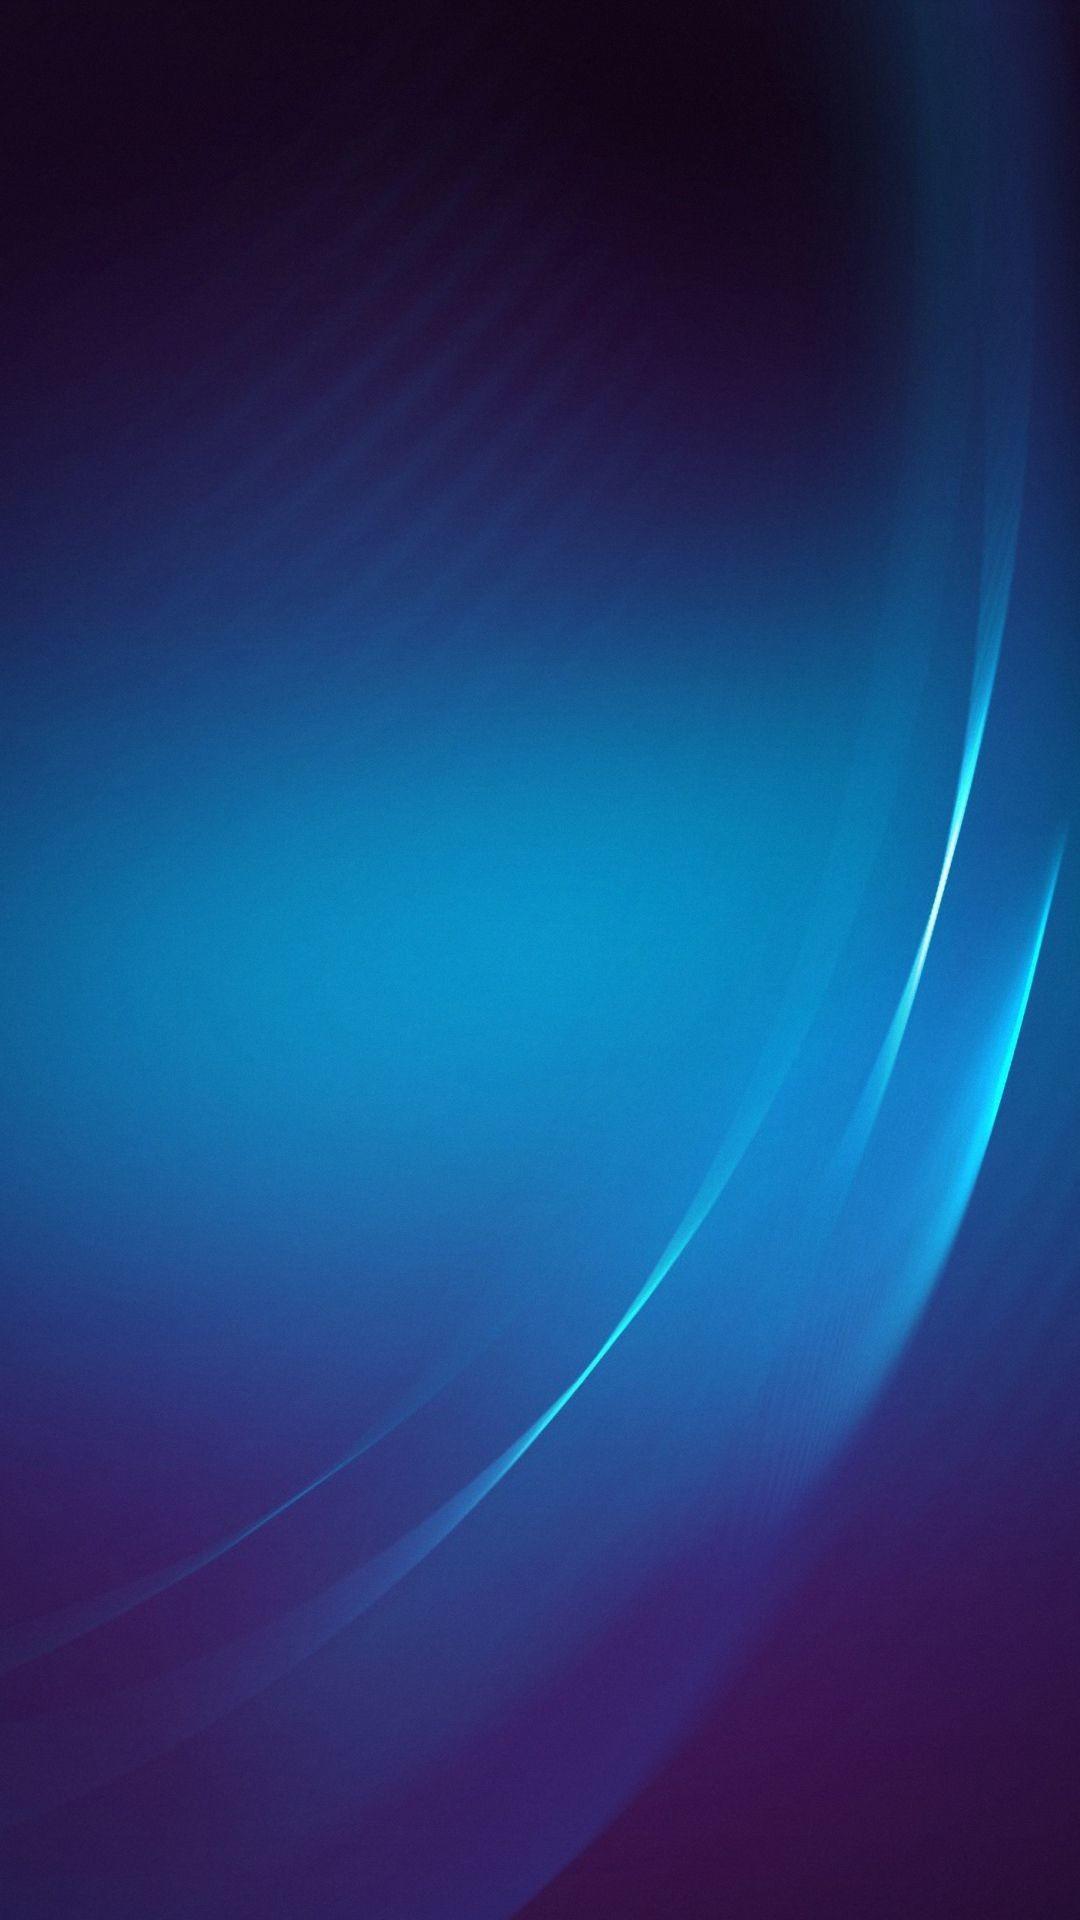 Blue Dragon galaxy s4 s5 Wallpapers HD 1080×1920